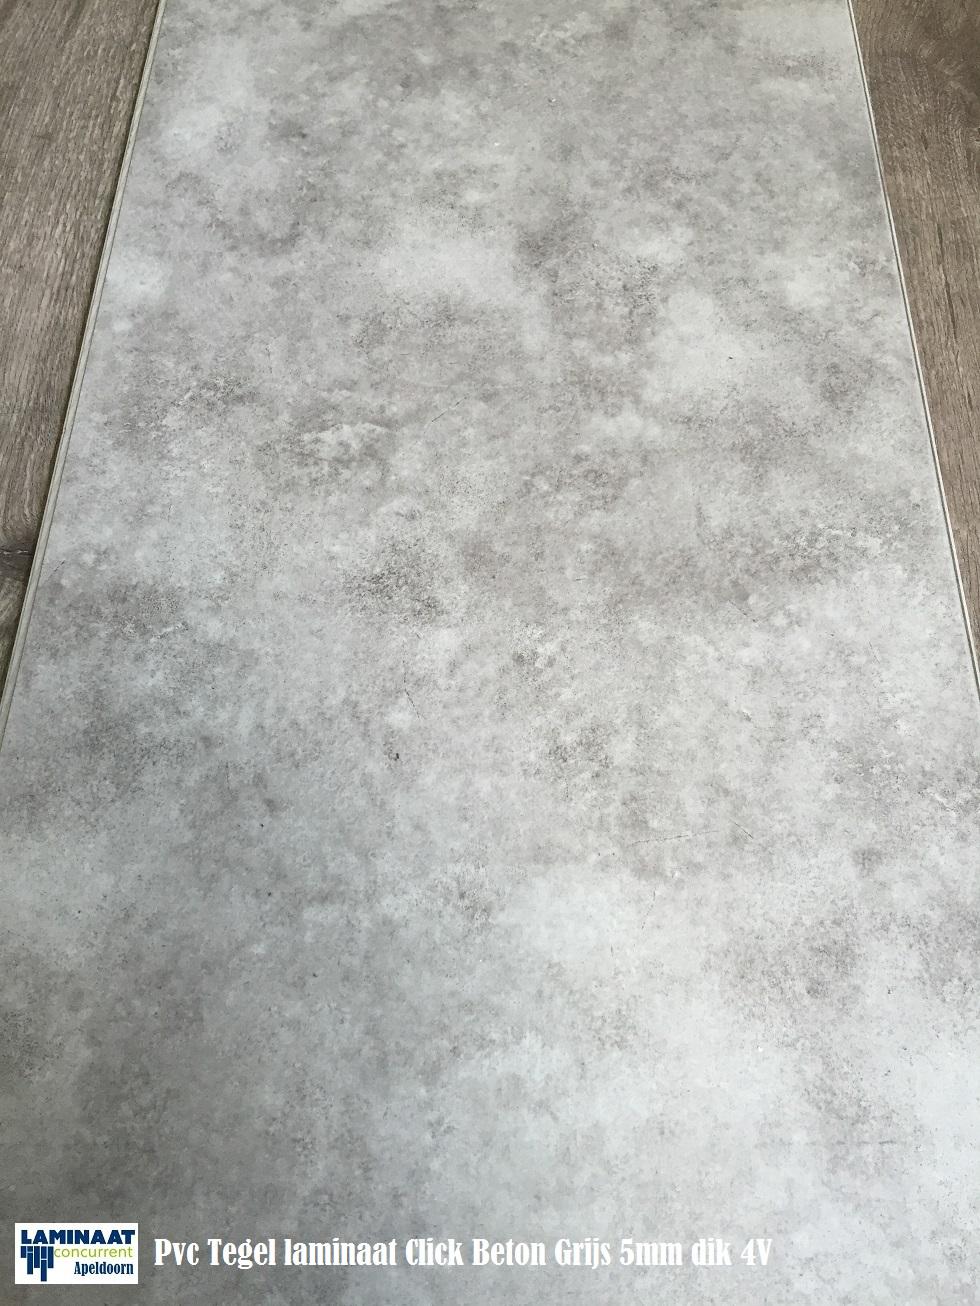 Pvc beton grijs 1 laminaat concurrent for Tegel pvc imitatie tegel cement